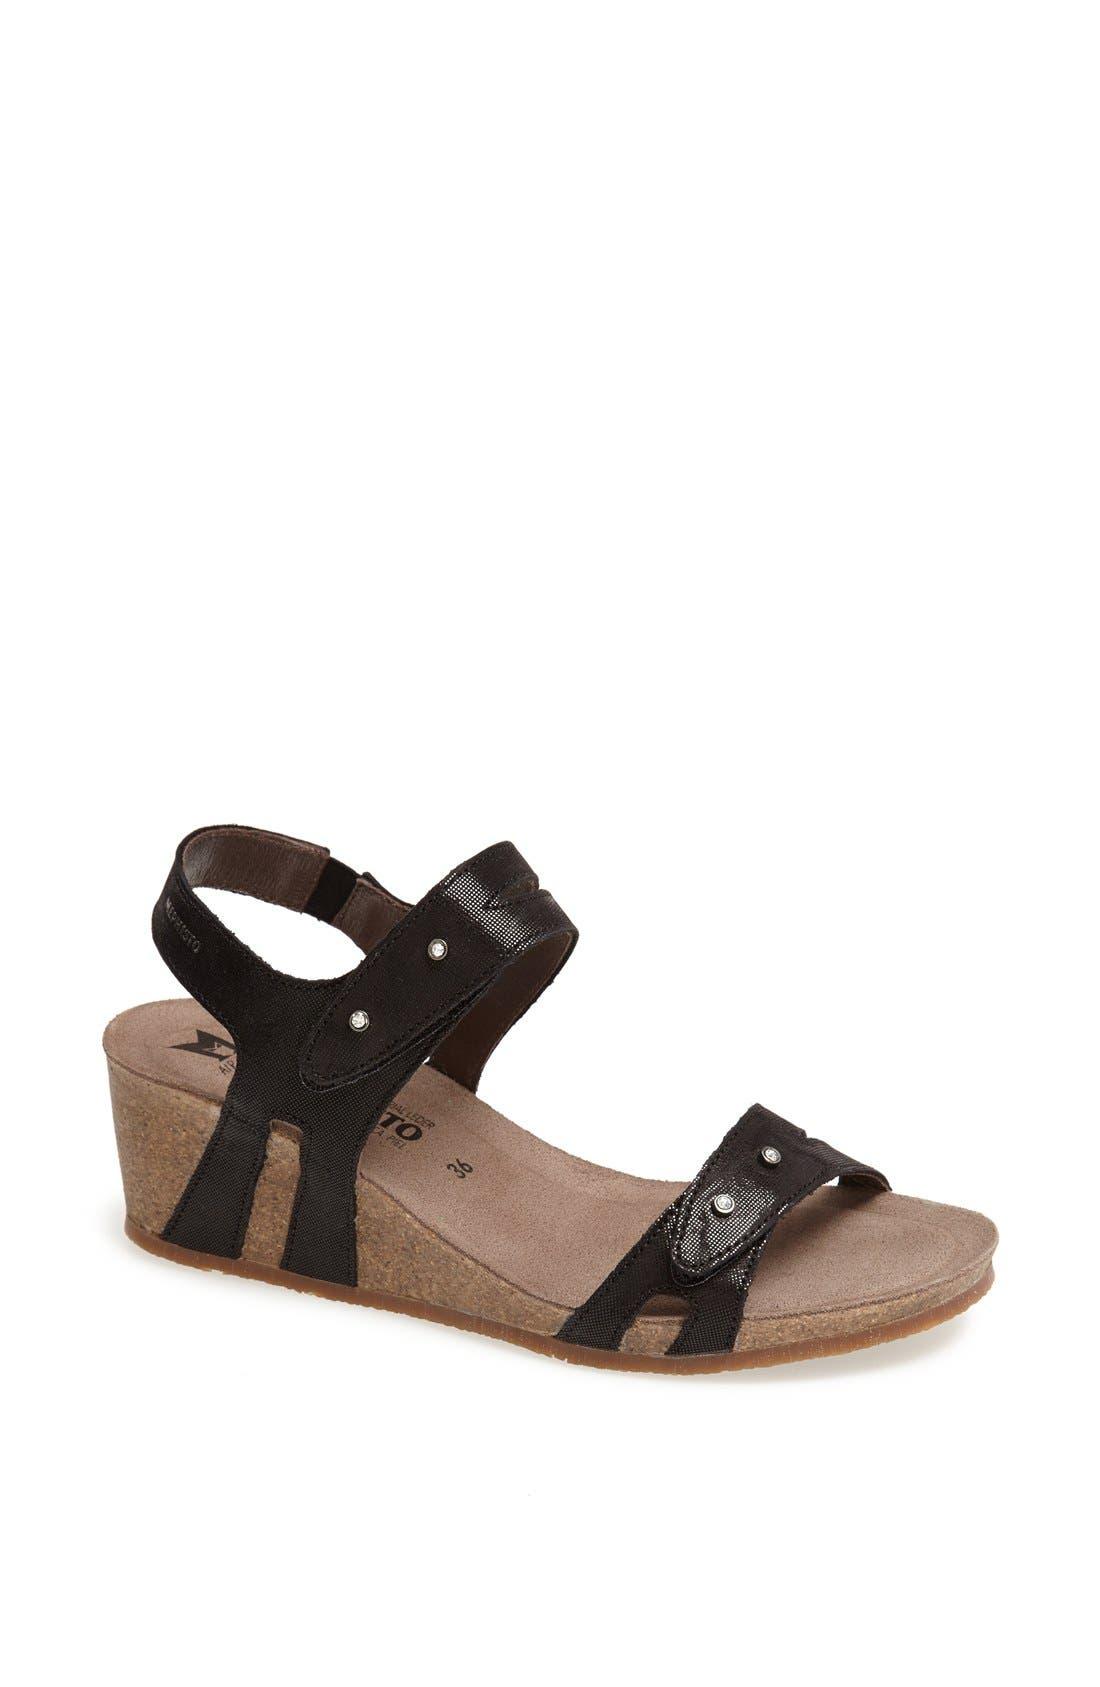 'Minoa' Wedge Sandal,                             Main thumbnail 1, color,                             BLACK